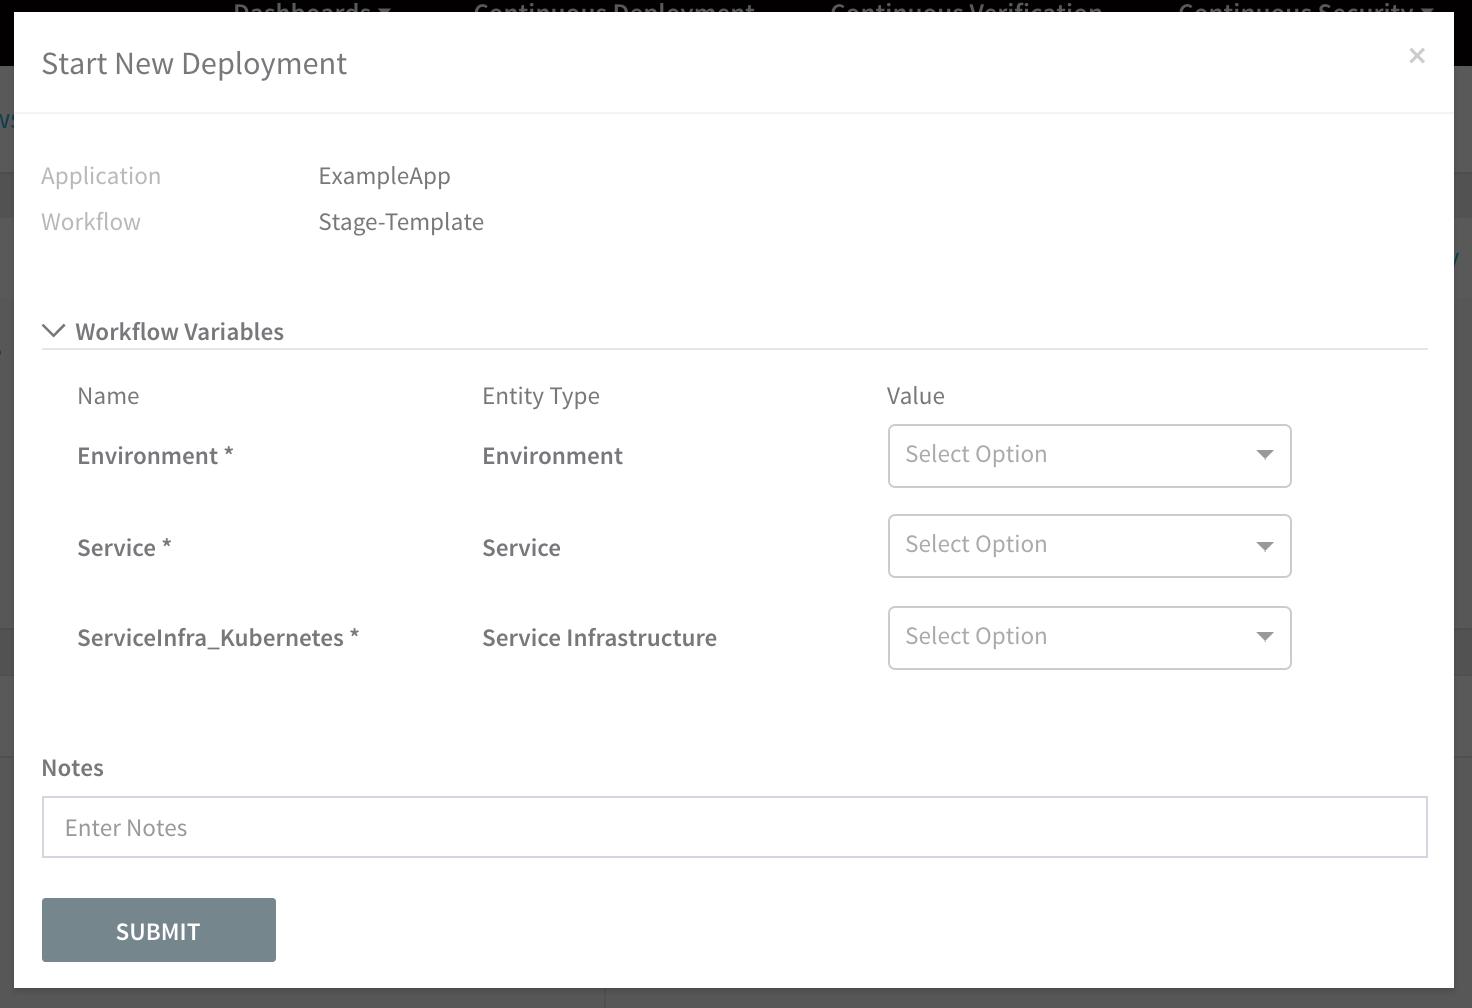 Workflows - Harness io Docs